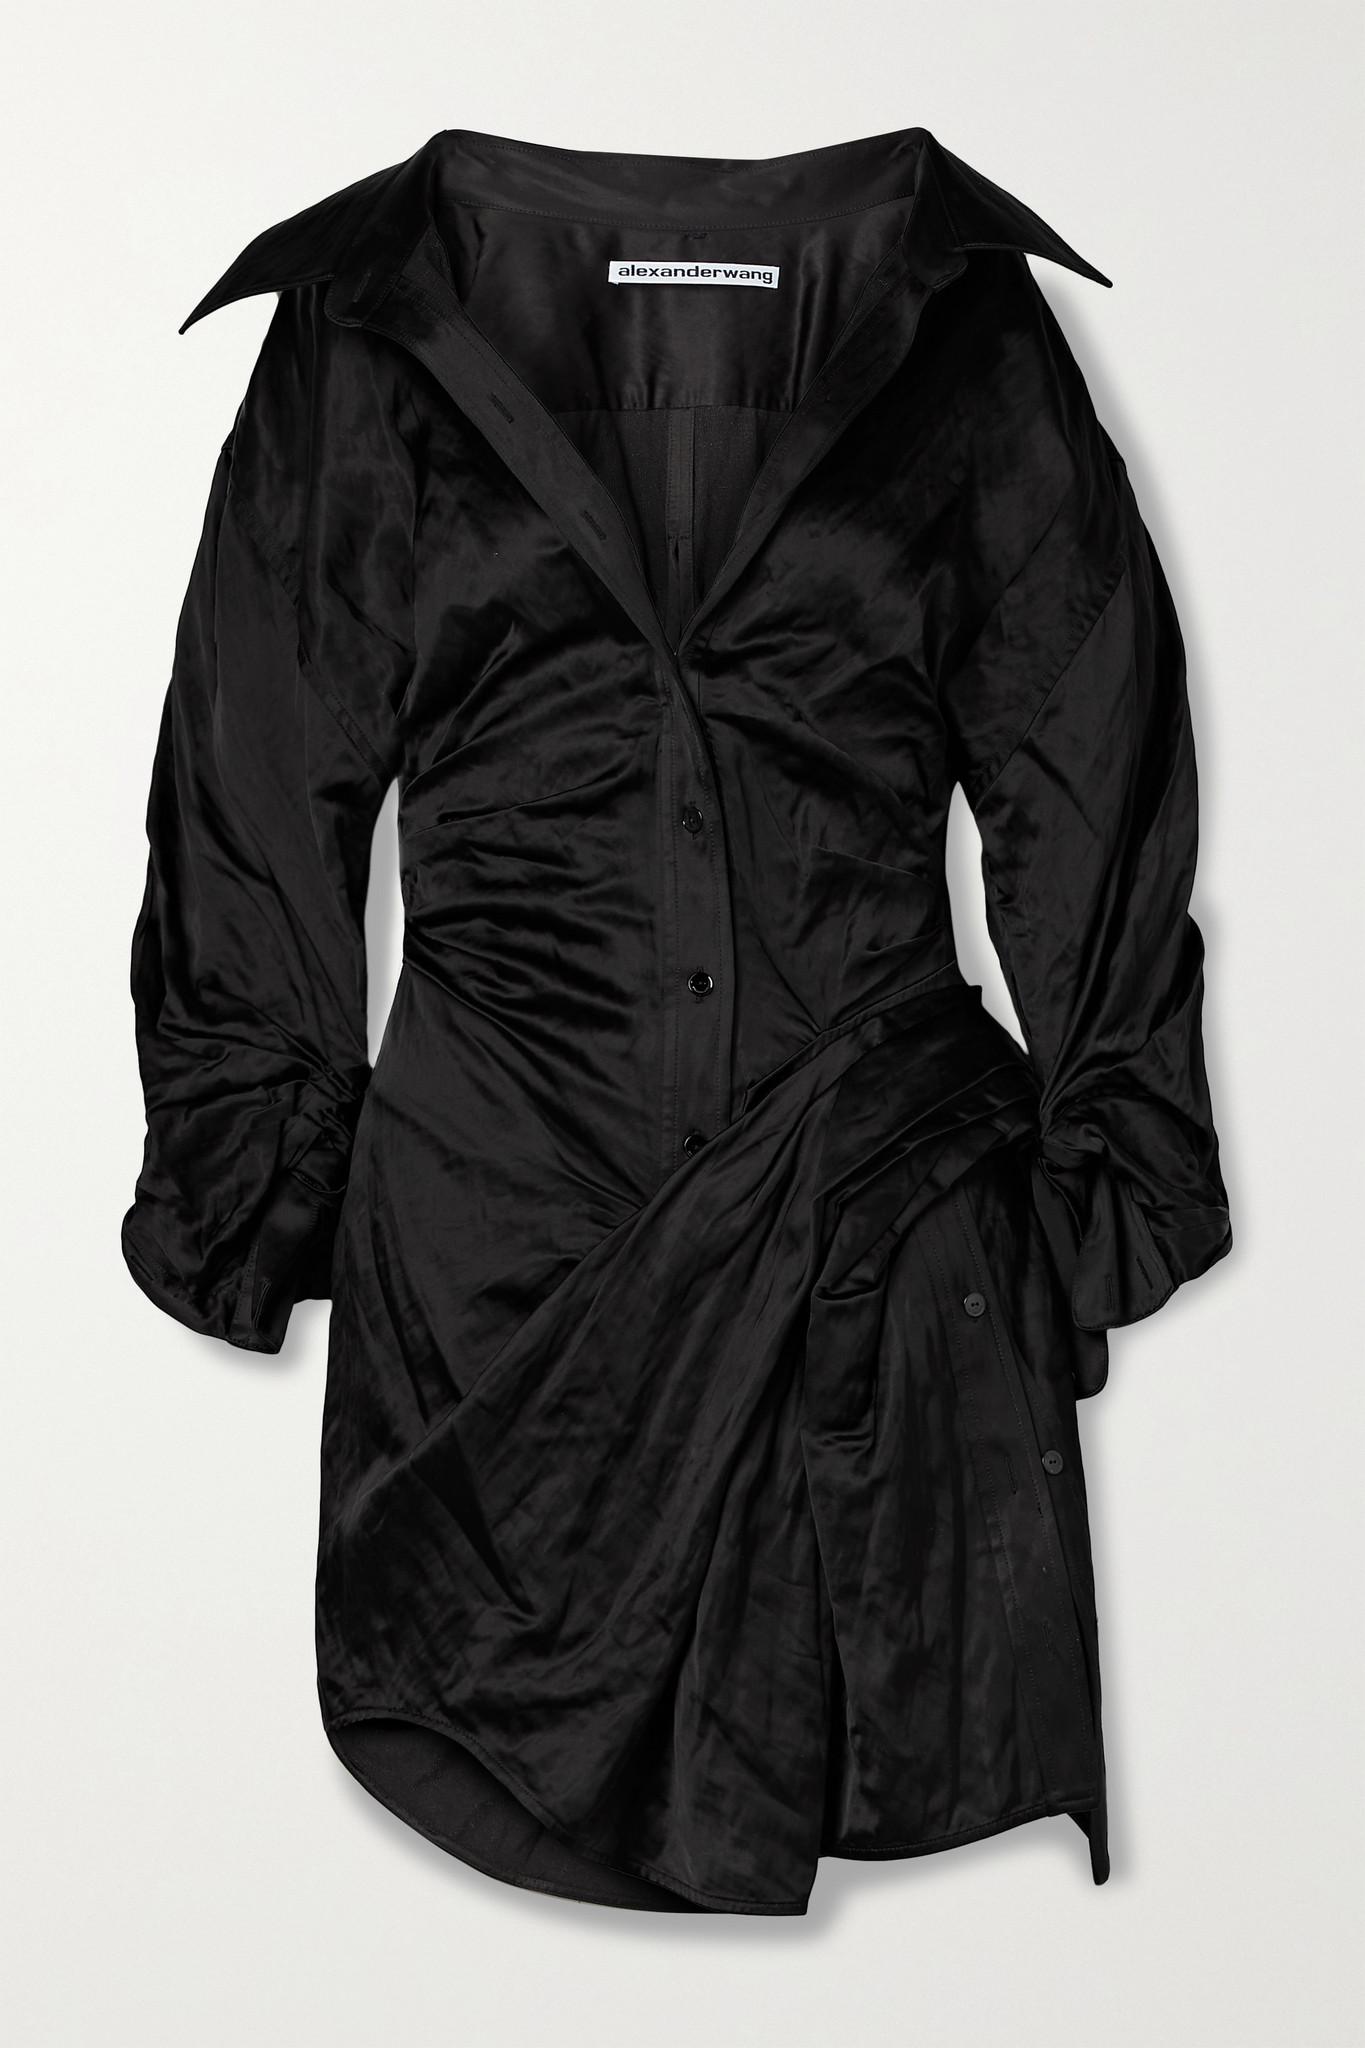 ALEXANDER WANG - 褶饰皱褶缎布迷你衬衫式连衣裙 - 黑色 - US4